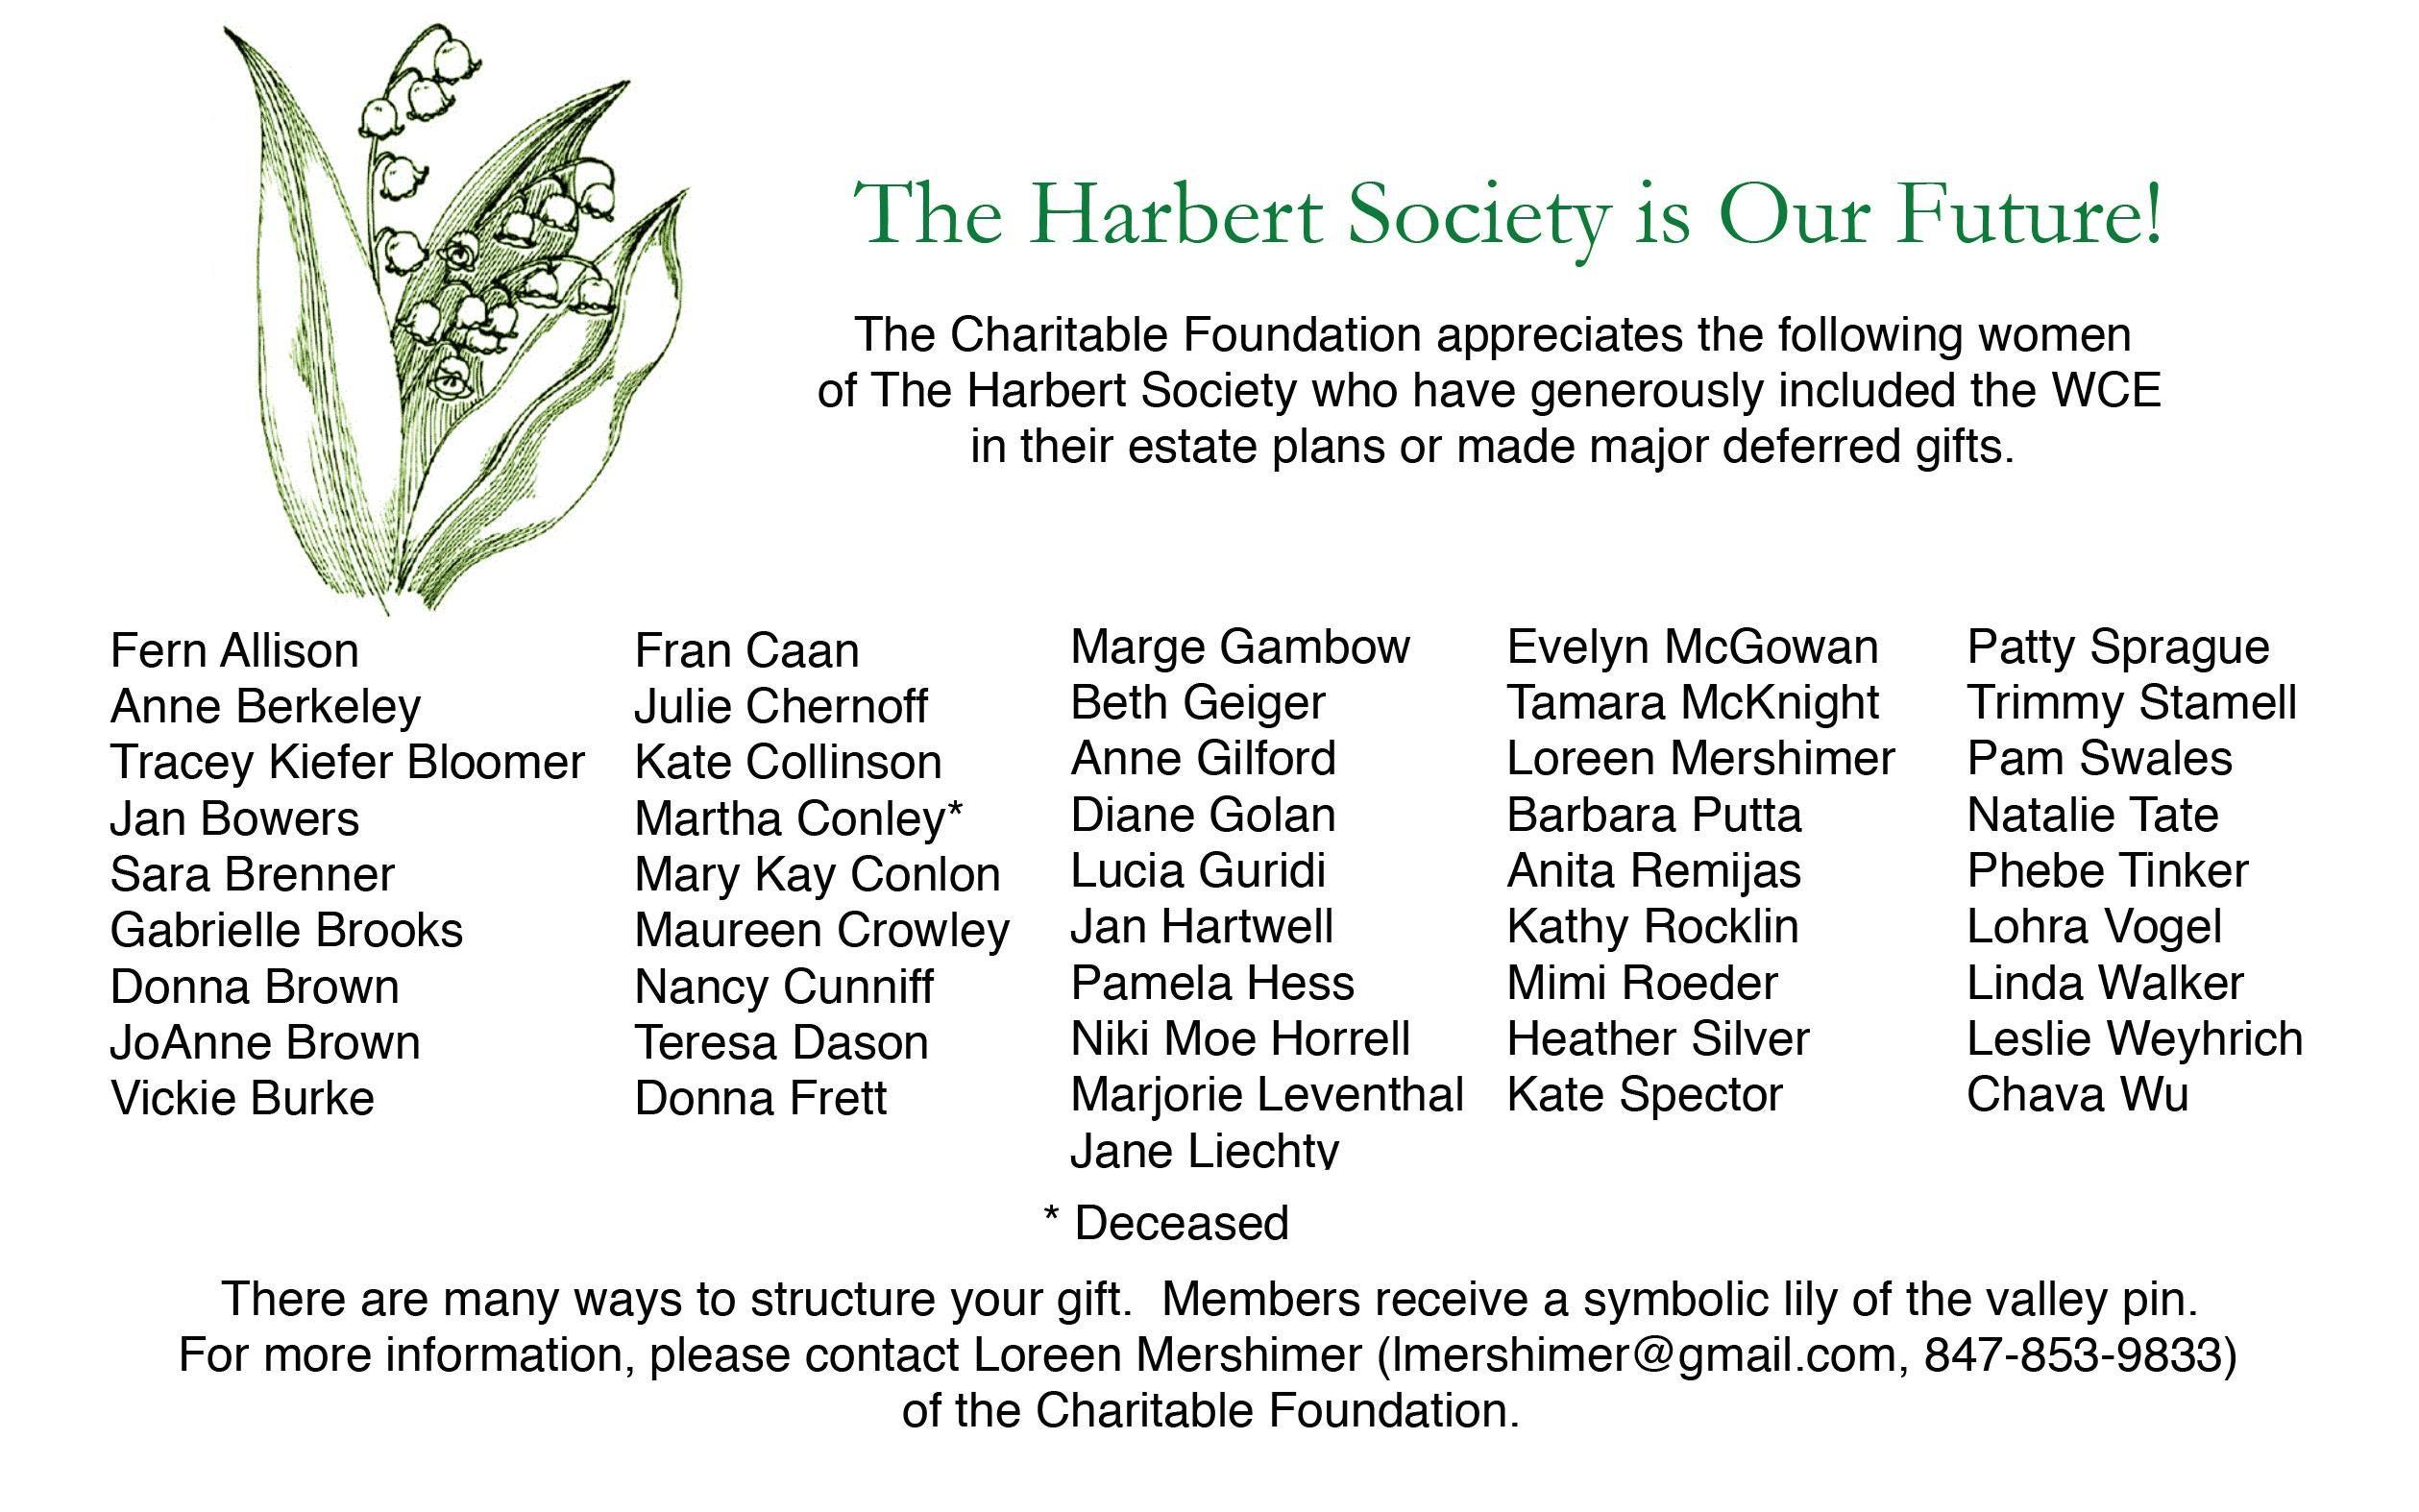 Page 22 of Harbert Society